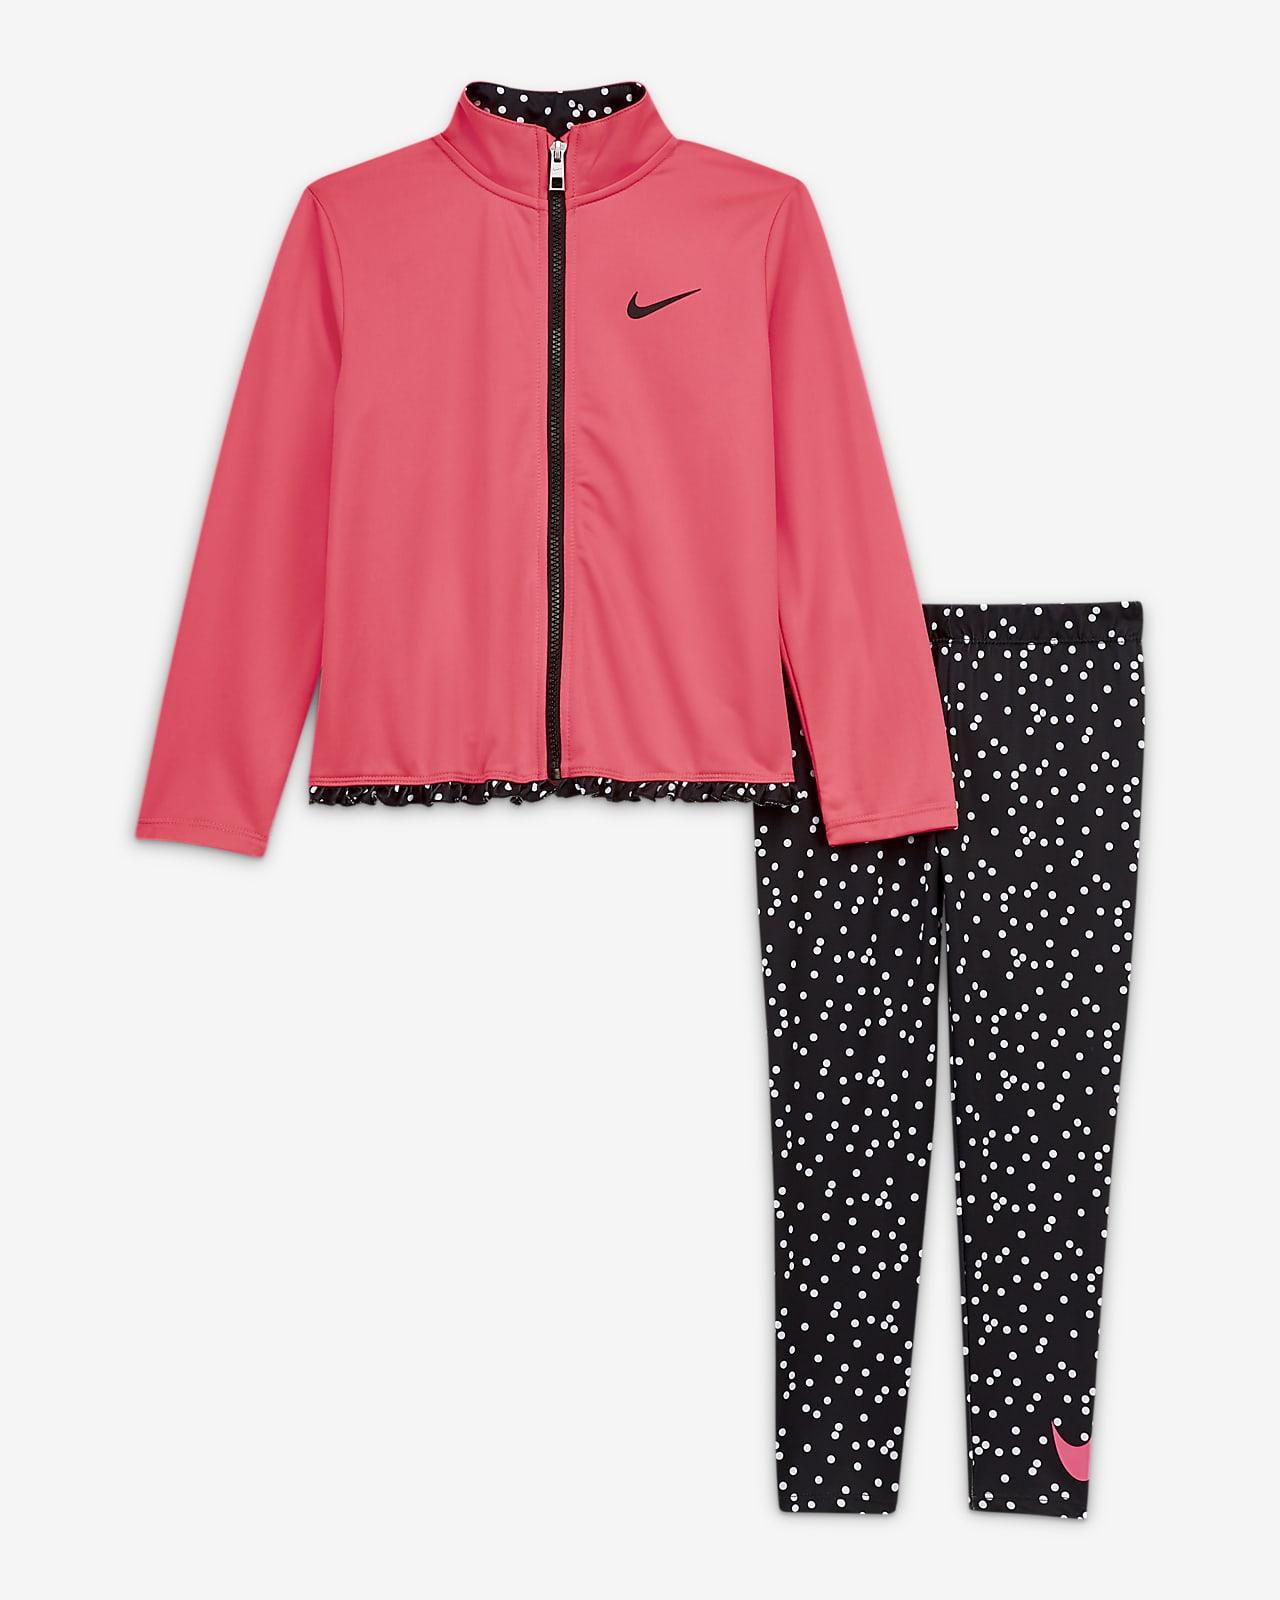 Nike Little Kids' Jacket and Leggings Set